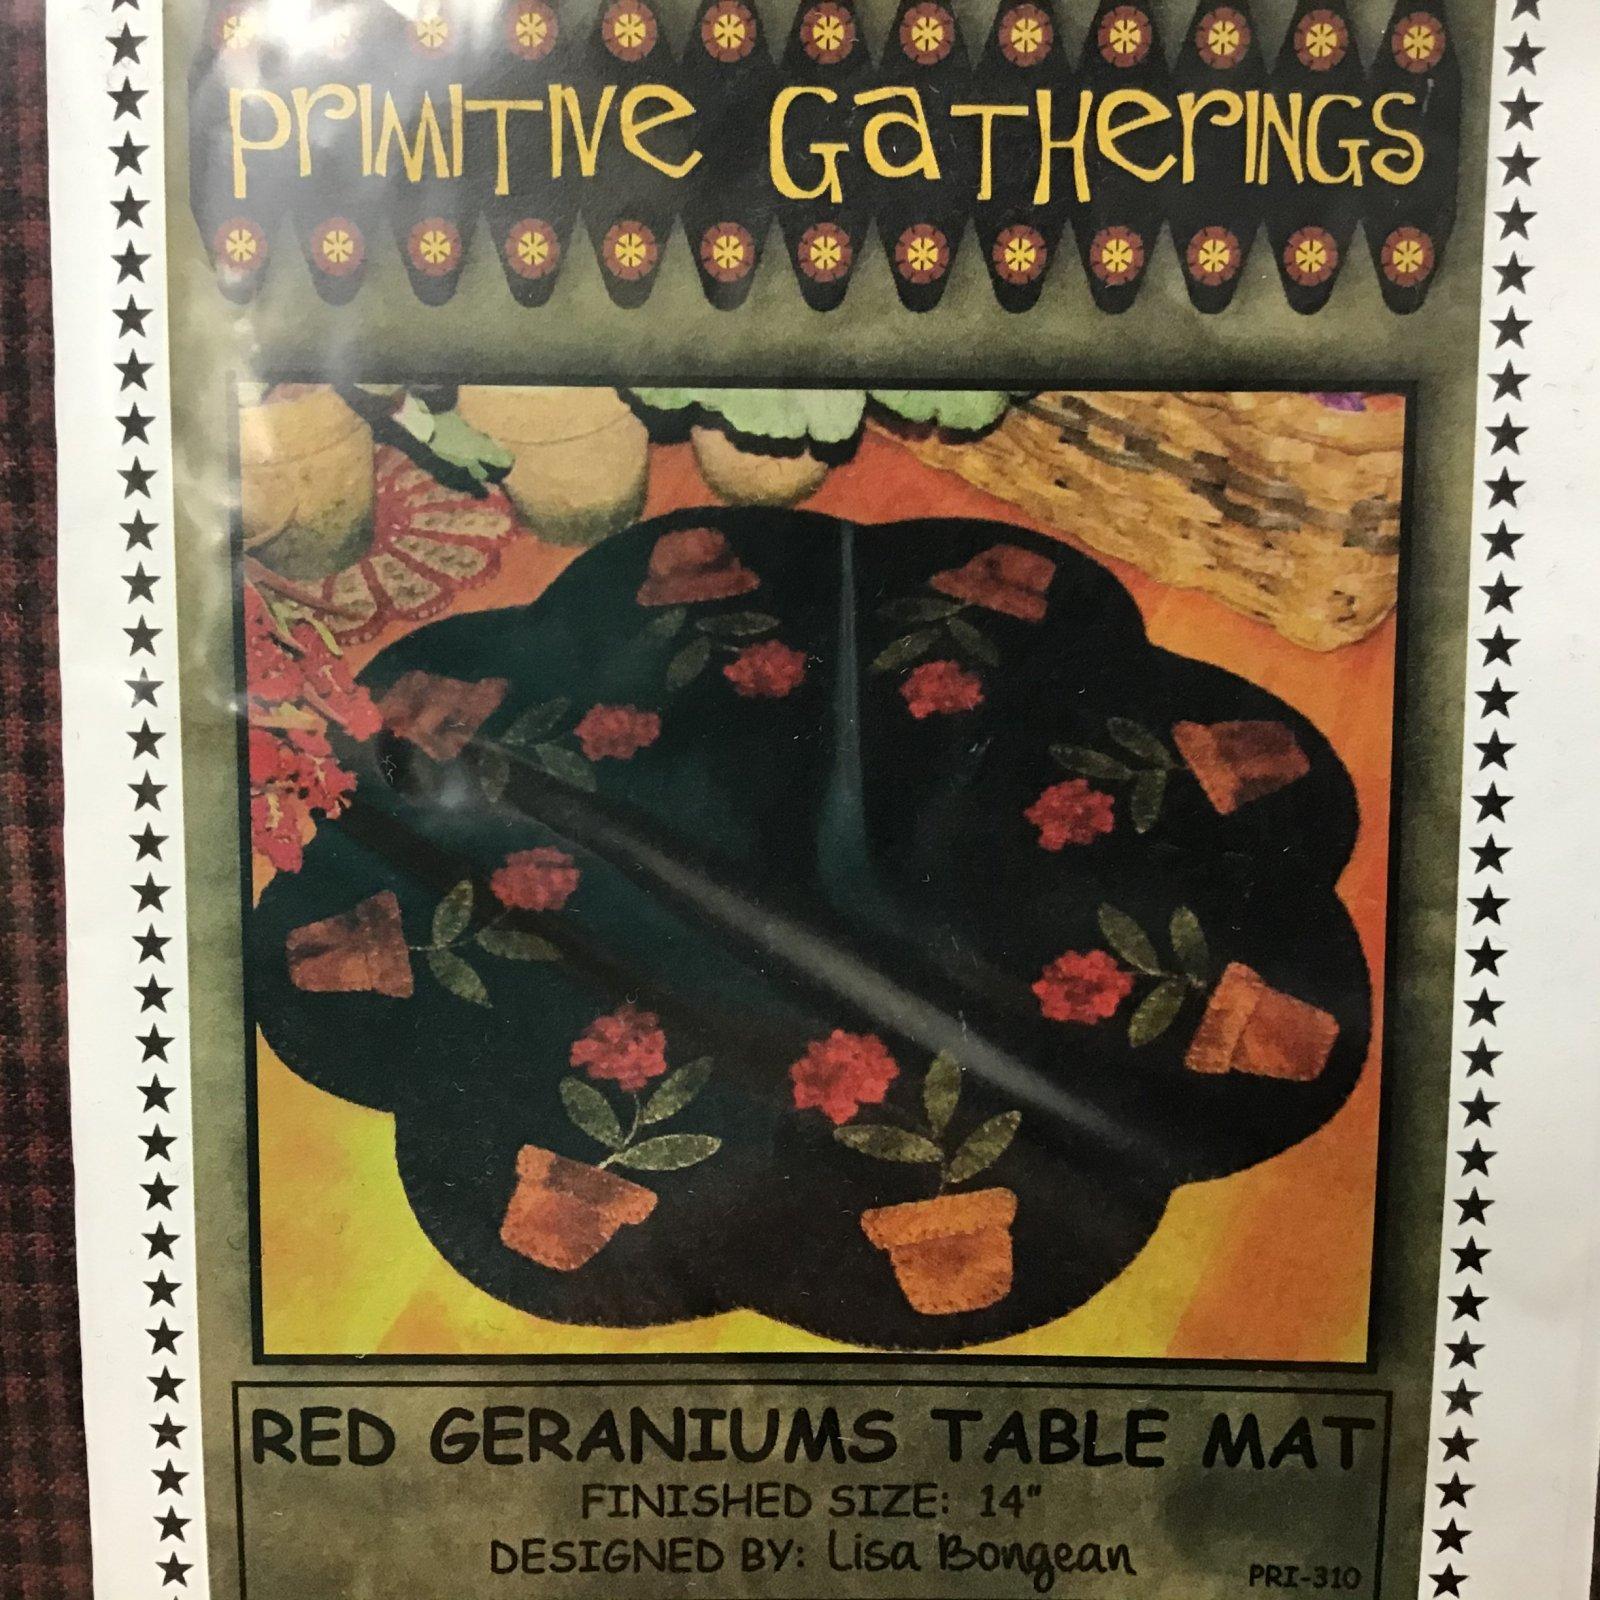 Kit W Primitive Gatherings Red Geraniums Table Mat